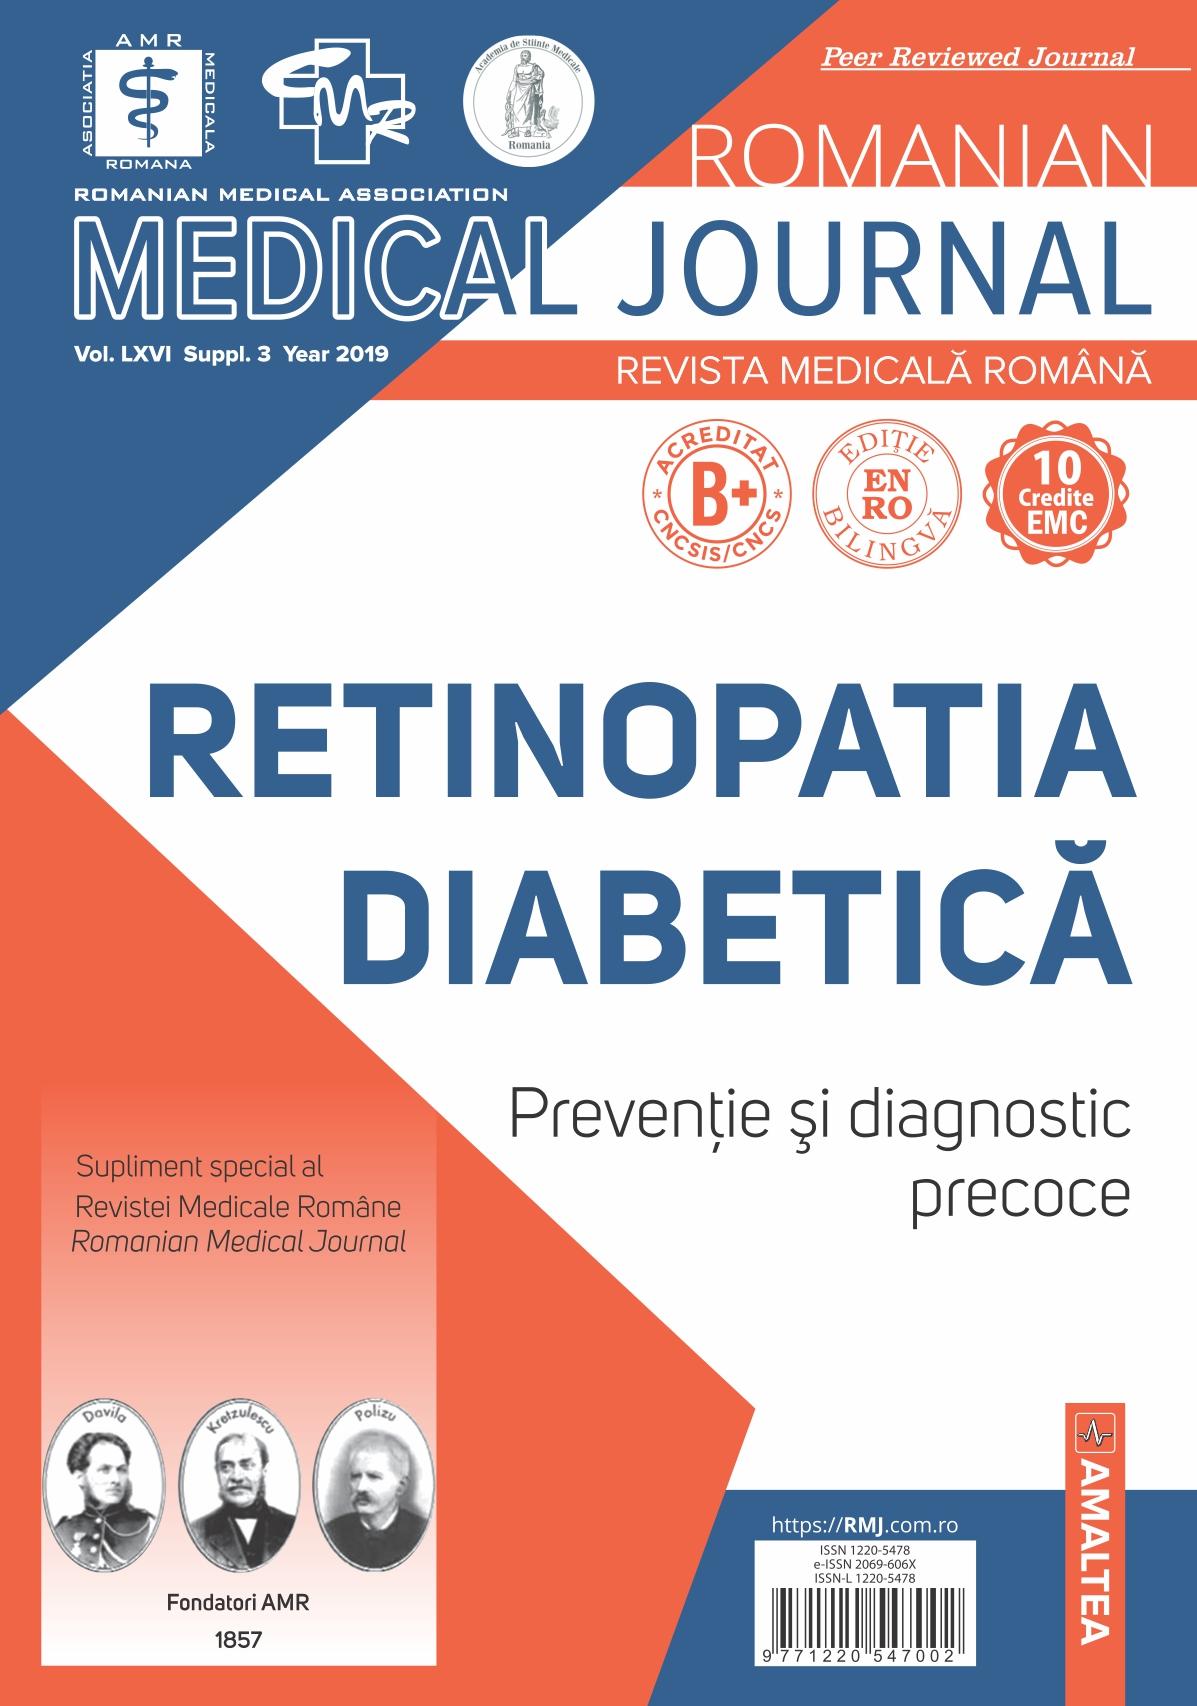 Romanian Medical Journal - REVISTA MEDICALA ROMANA, Vol. LXVI, Suppl. 3, Year 2019